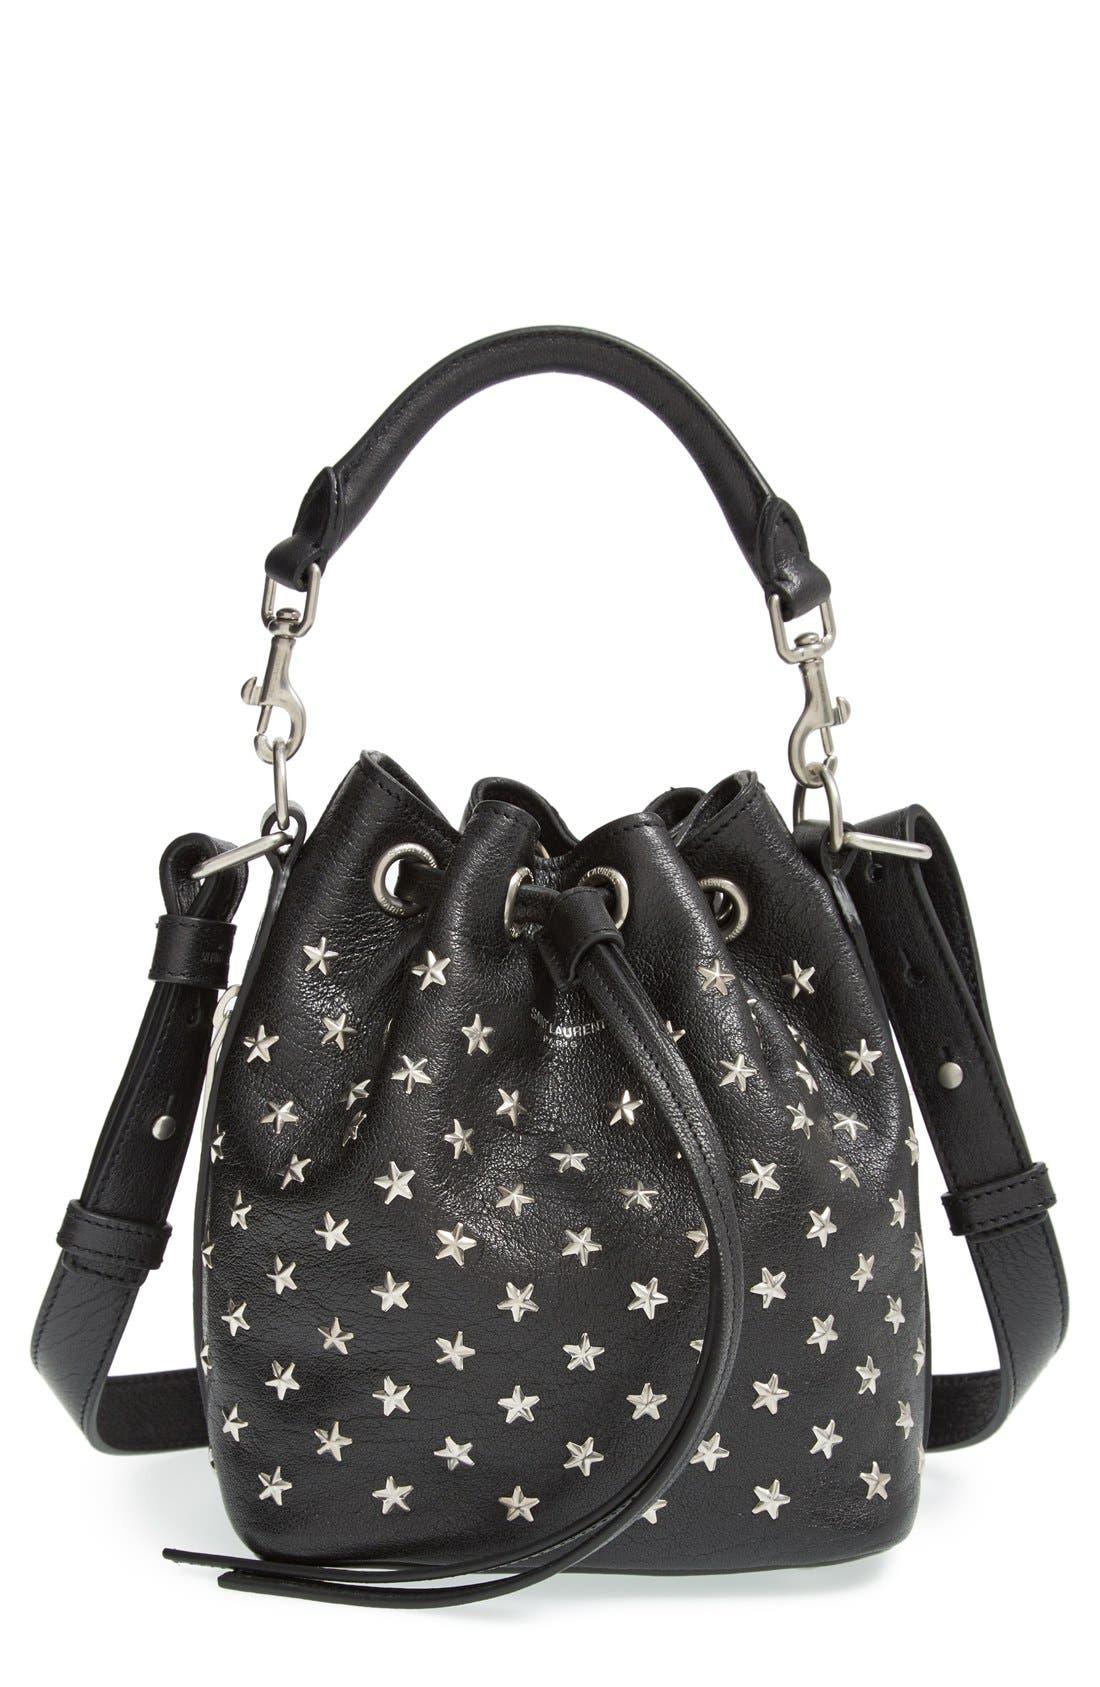 Main Image - Saint Laurent Studded Small Leather Bucket Bag